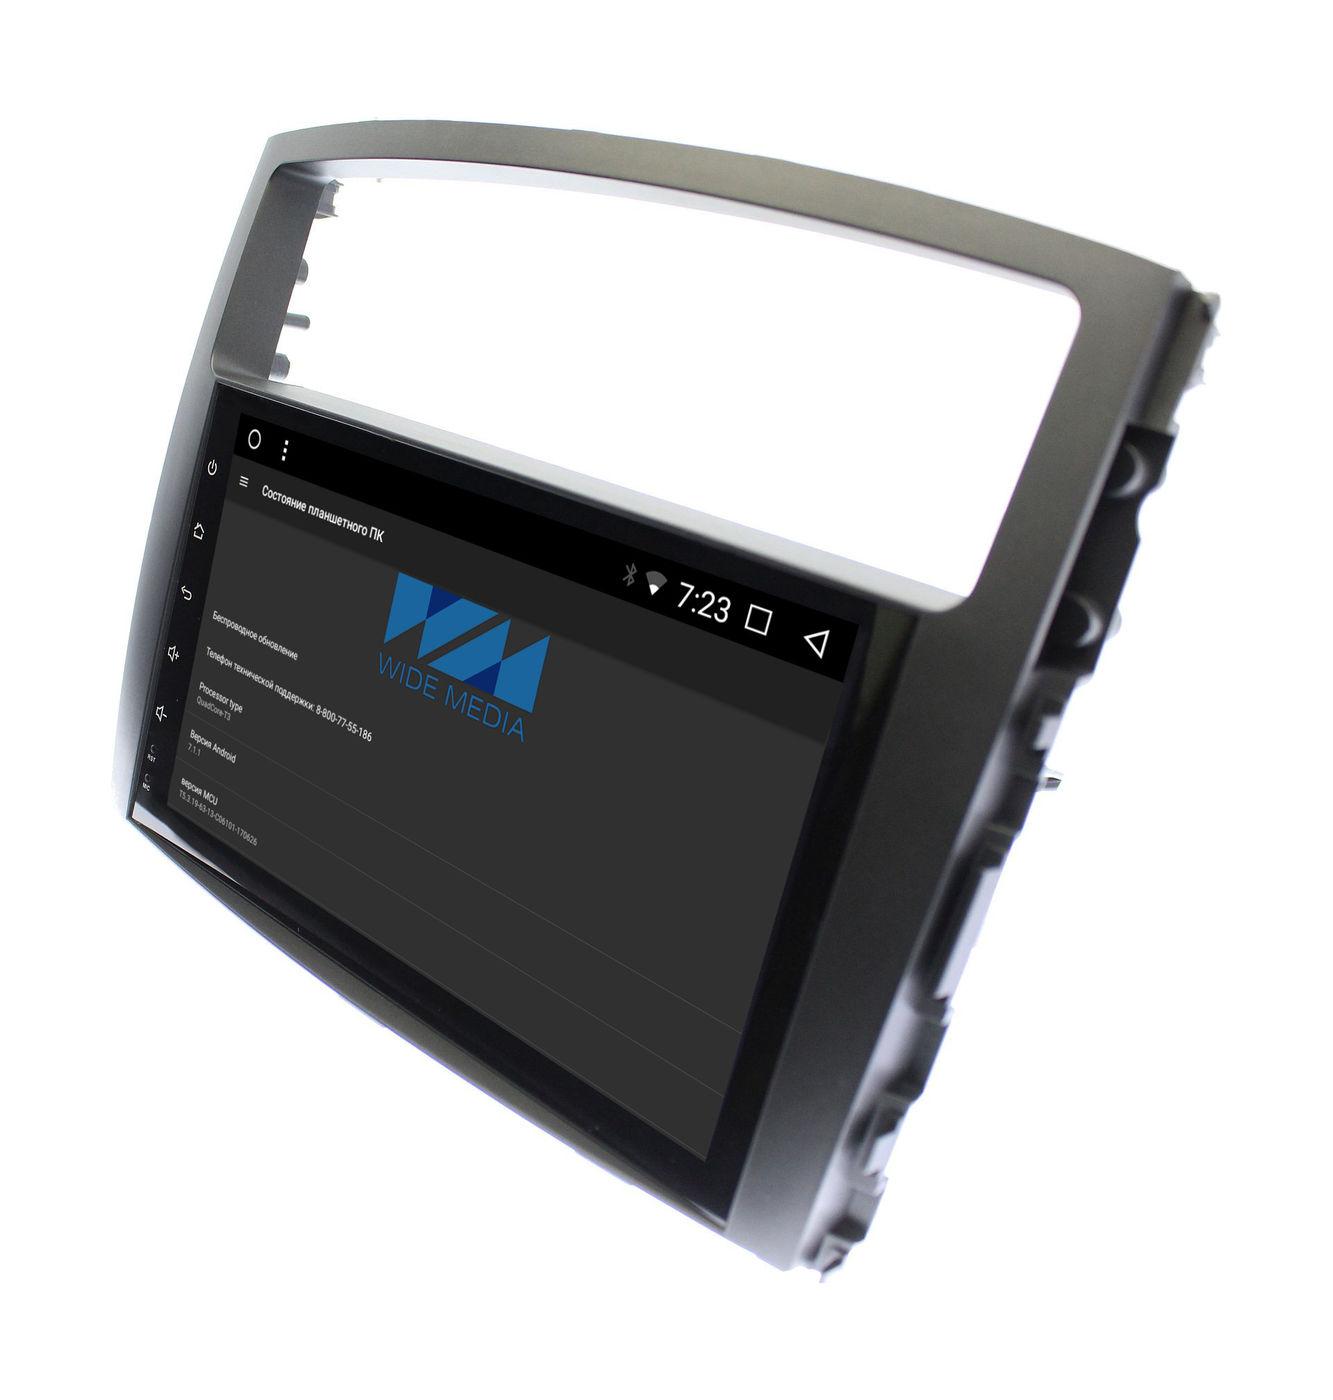 Штатная магнитола Wide Media WM-CF3046NB для Mitsubishi Pajero IV 2006-2018 (Rockford Fosgate) Android 7.1.2